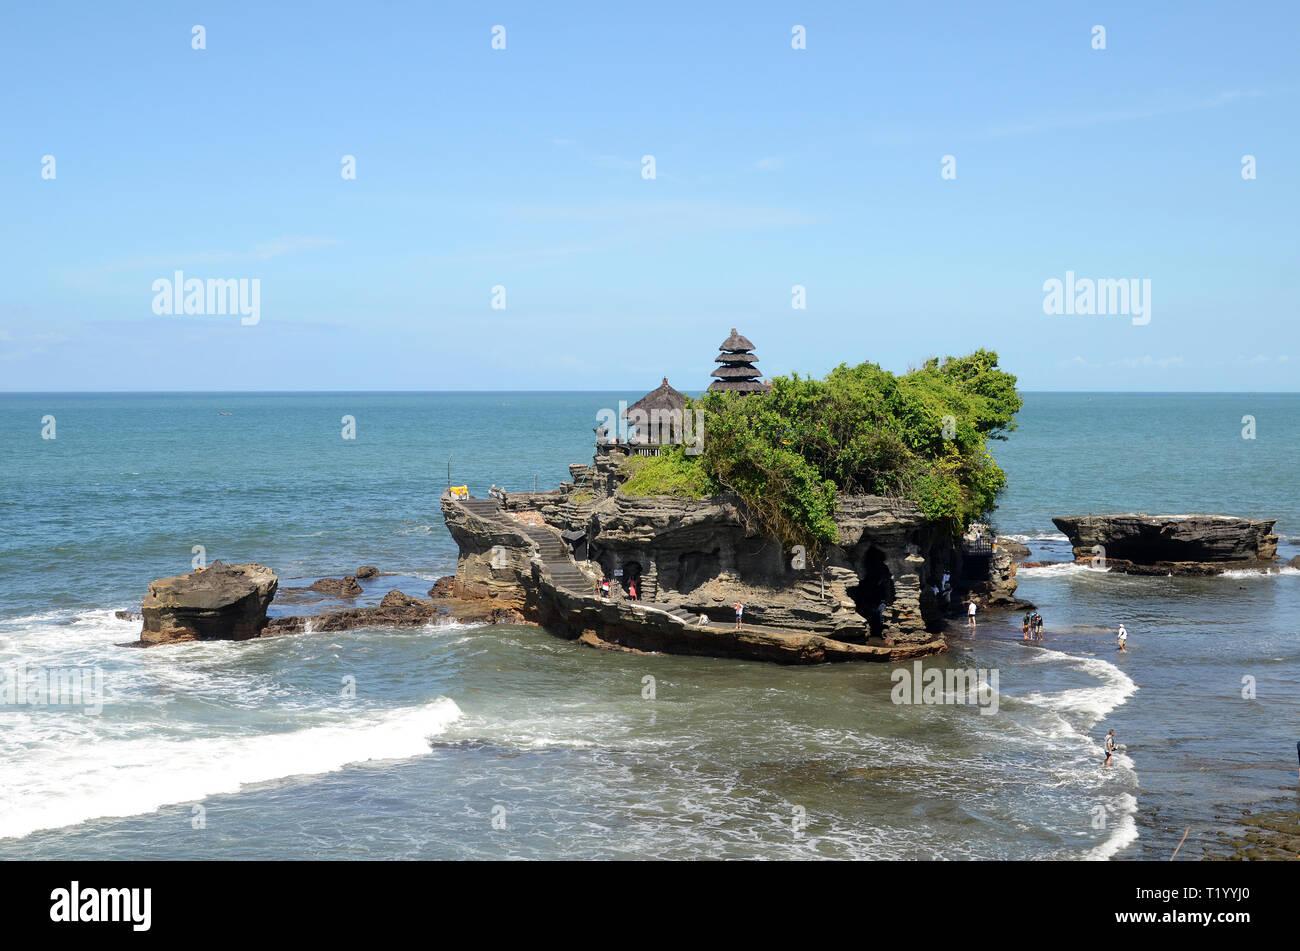 Tanah Lot Water Temple In Bali Island Indonesia Stock Photo